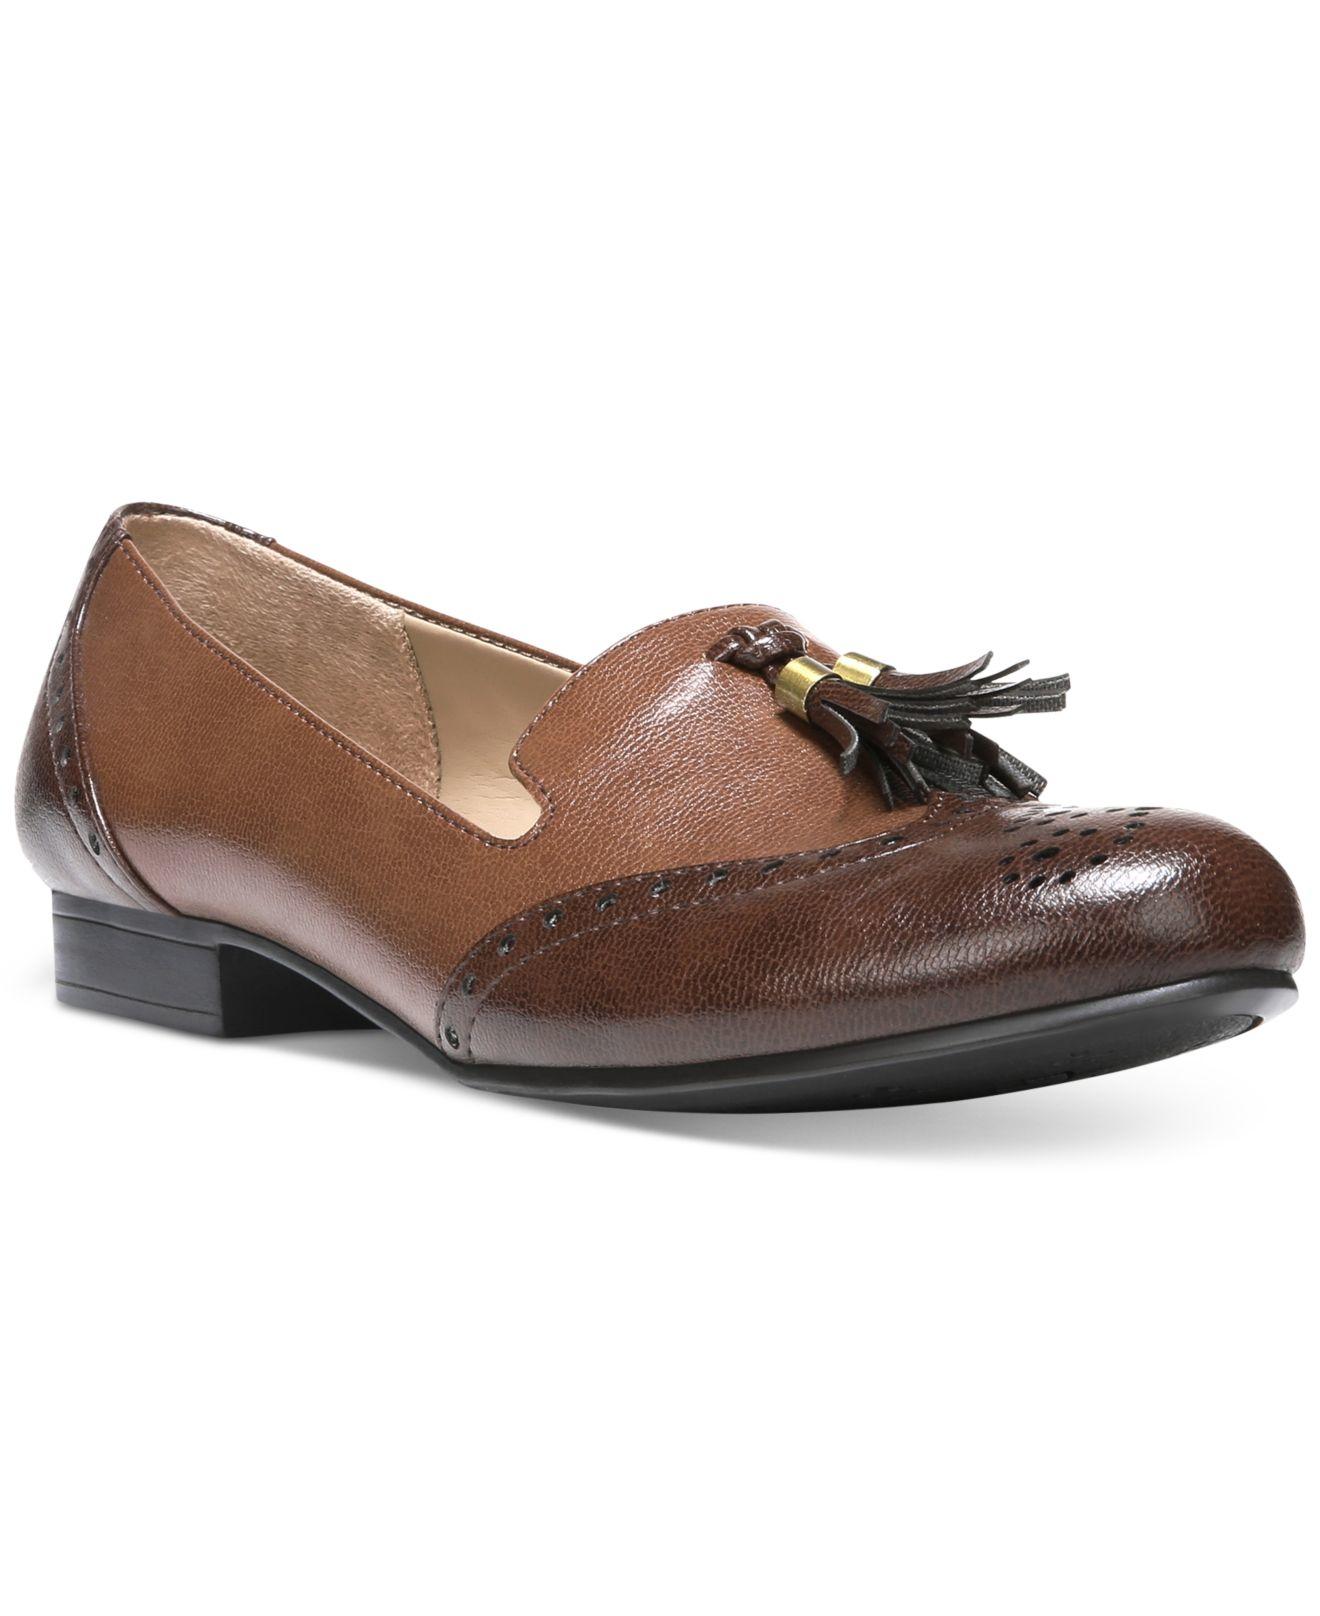 Naturalizer Tassel Shoes Macy S